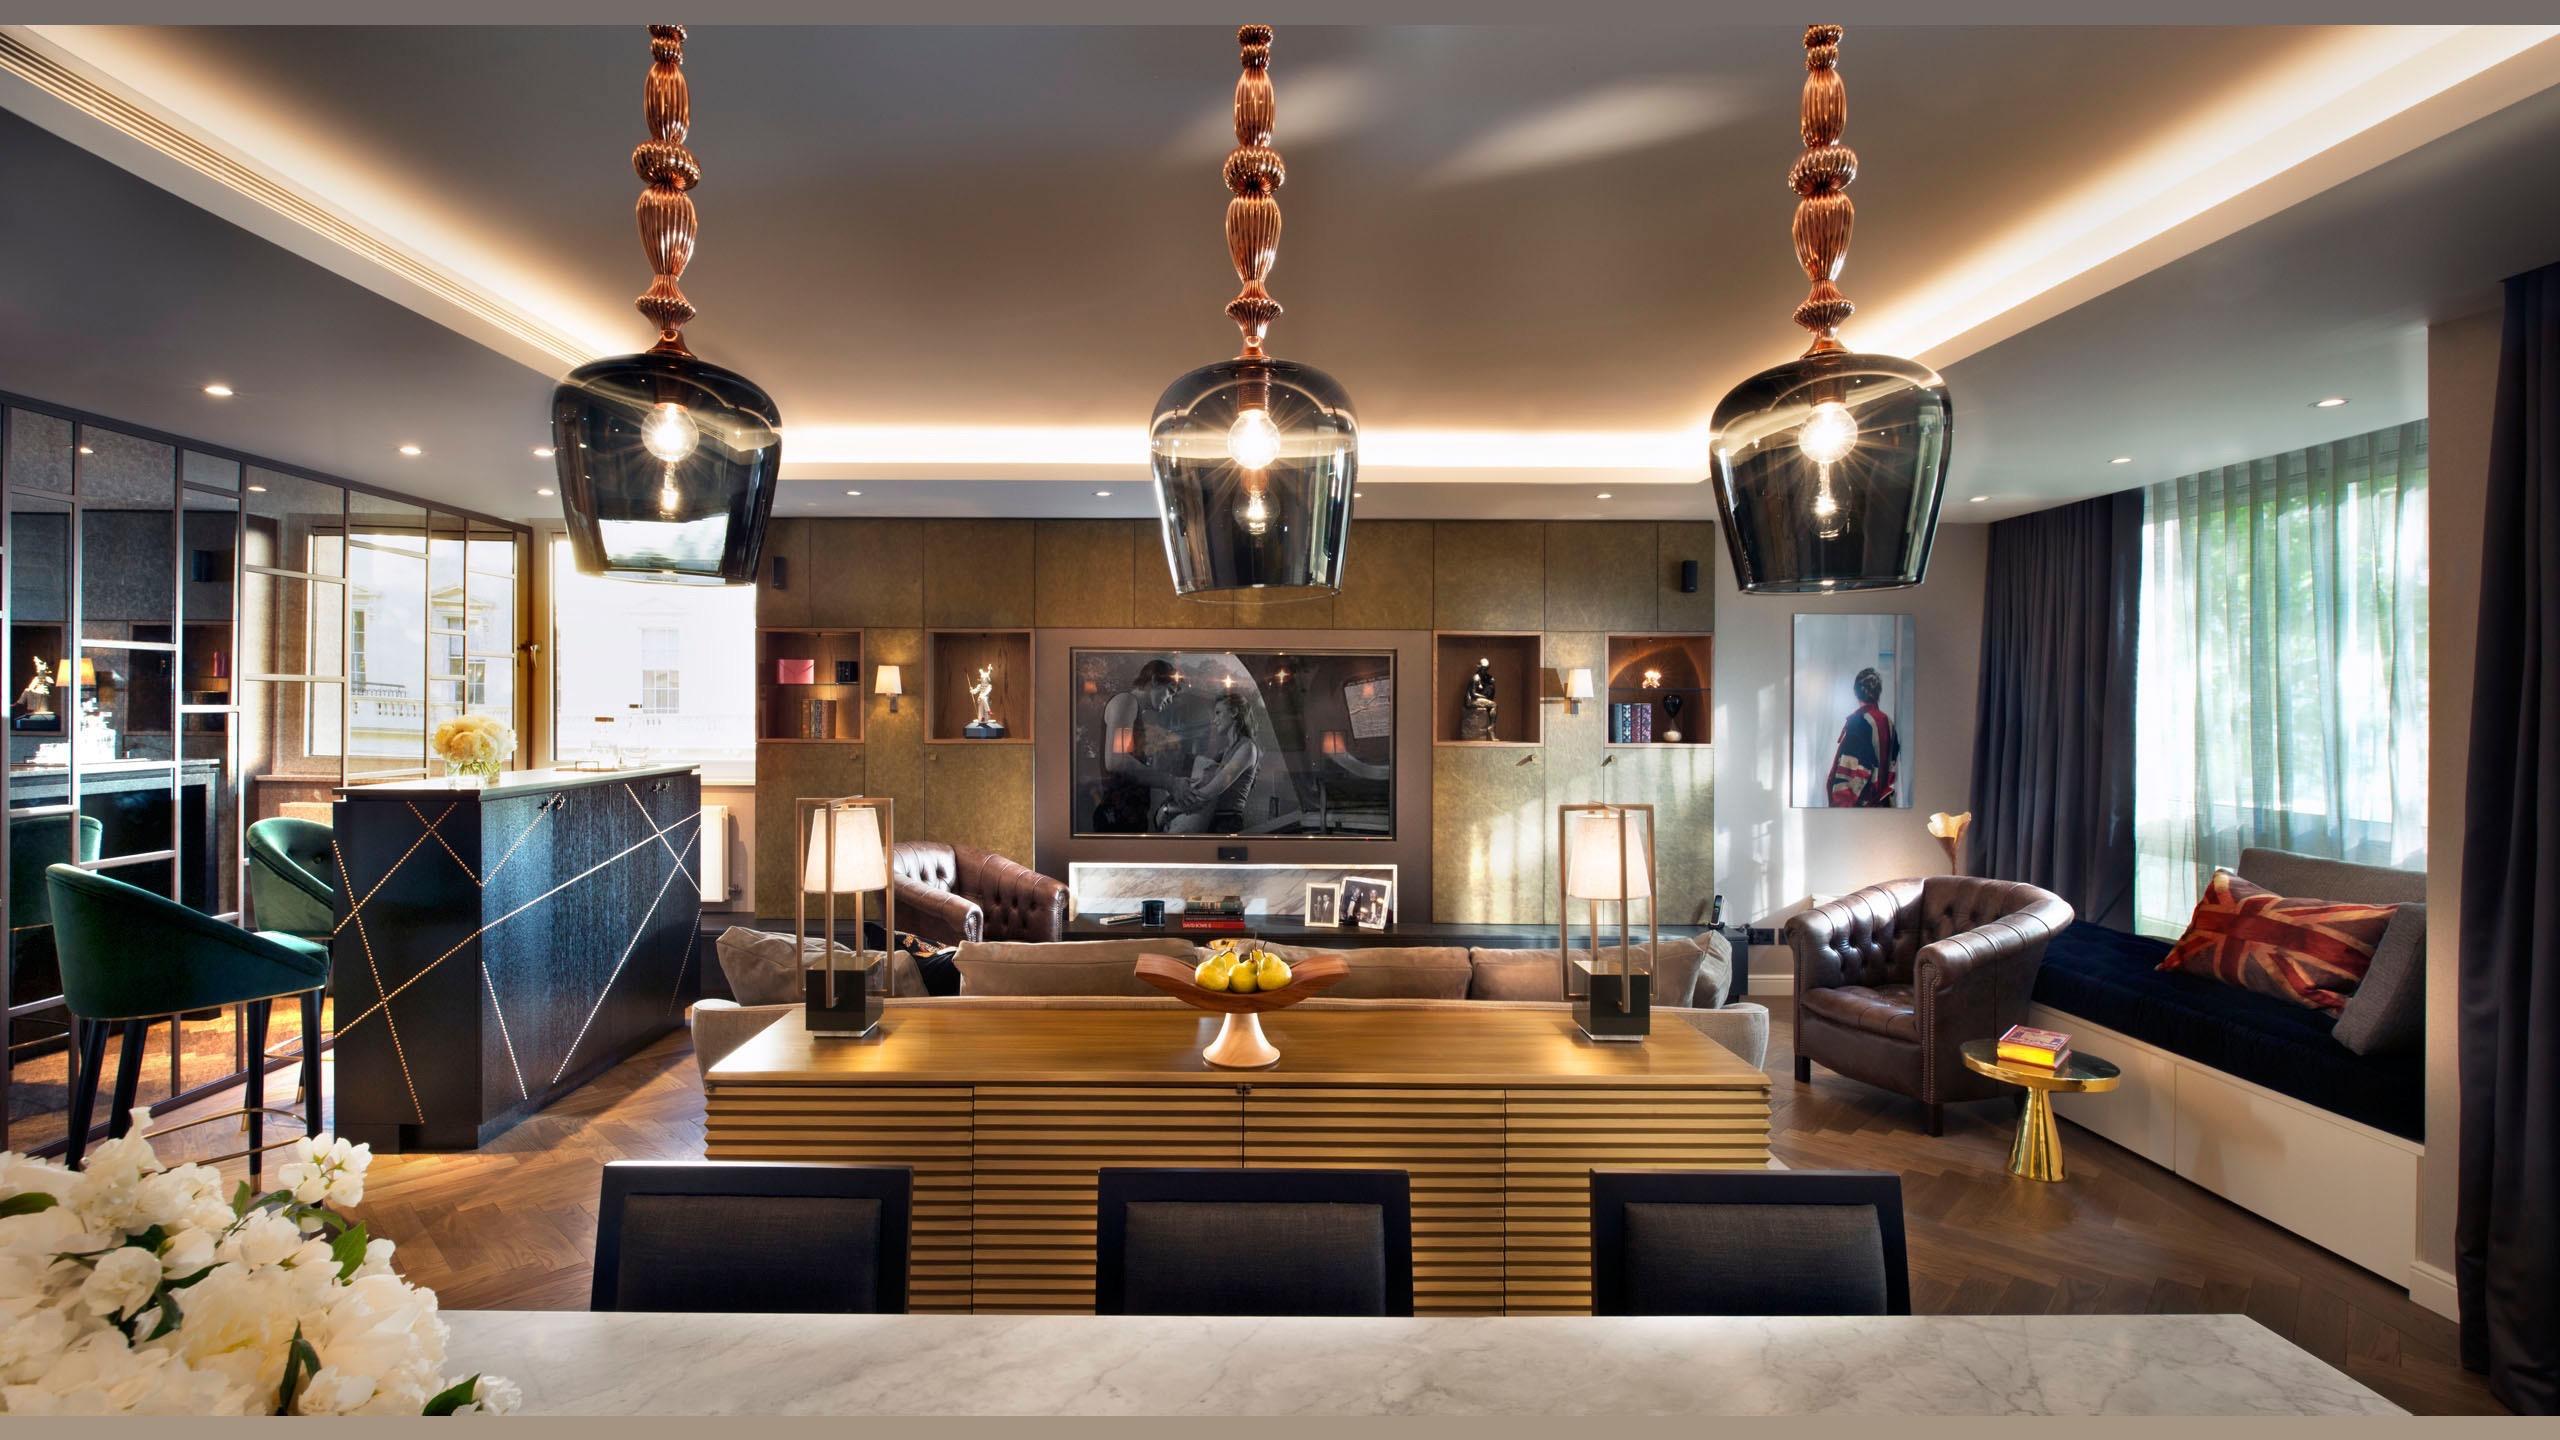 Home clic2control home automation - Interior design famosi ...